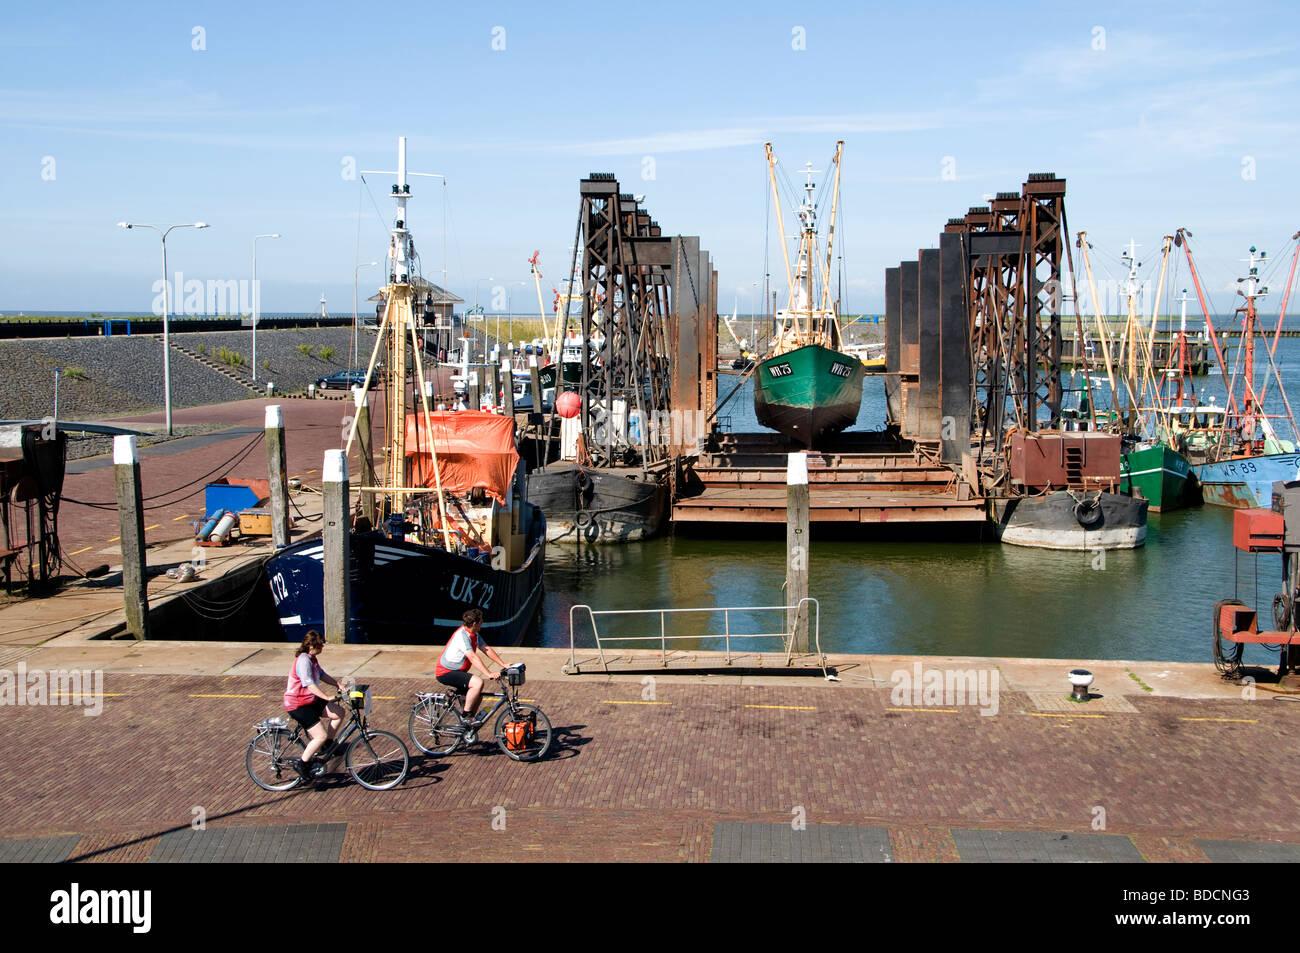 Den Oever  Netherlands fishing trawler floating dry dock shipyard port harbor Wadden Sea Waddenzee Wad - Stock Image